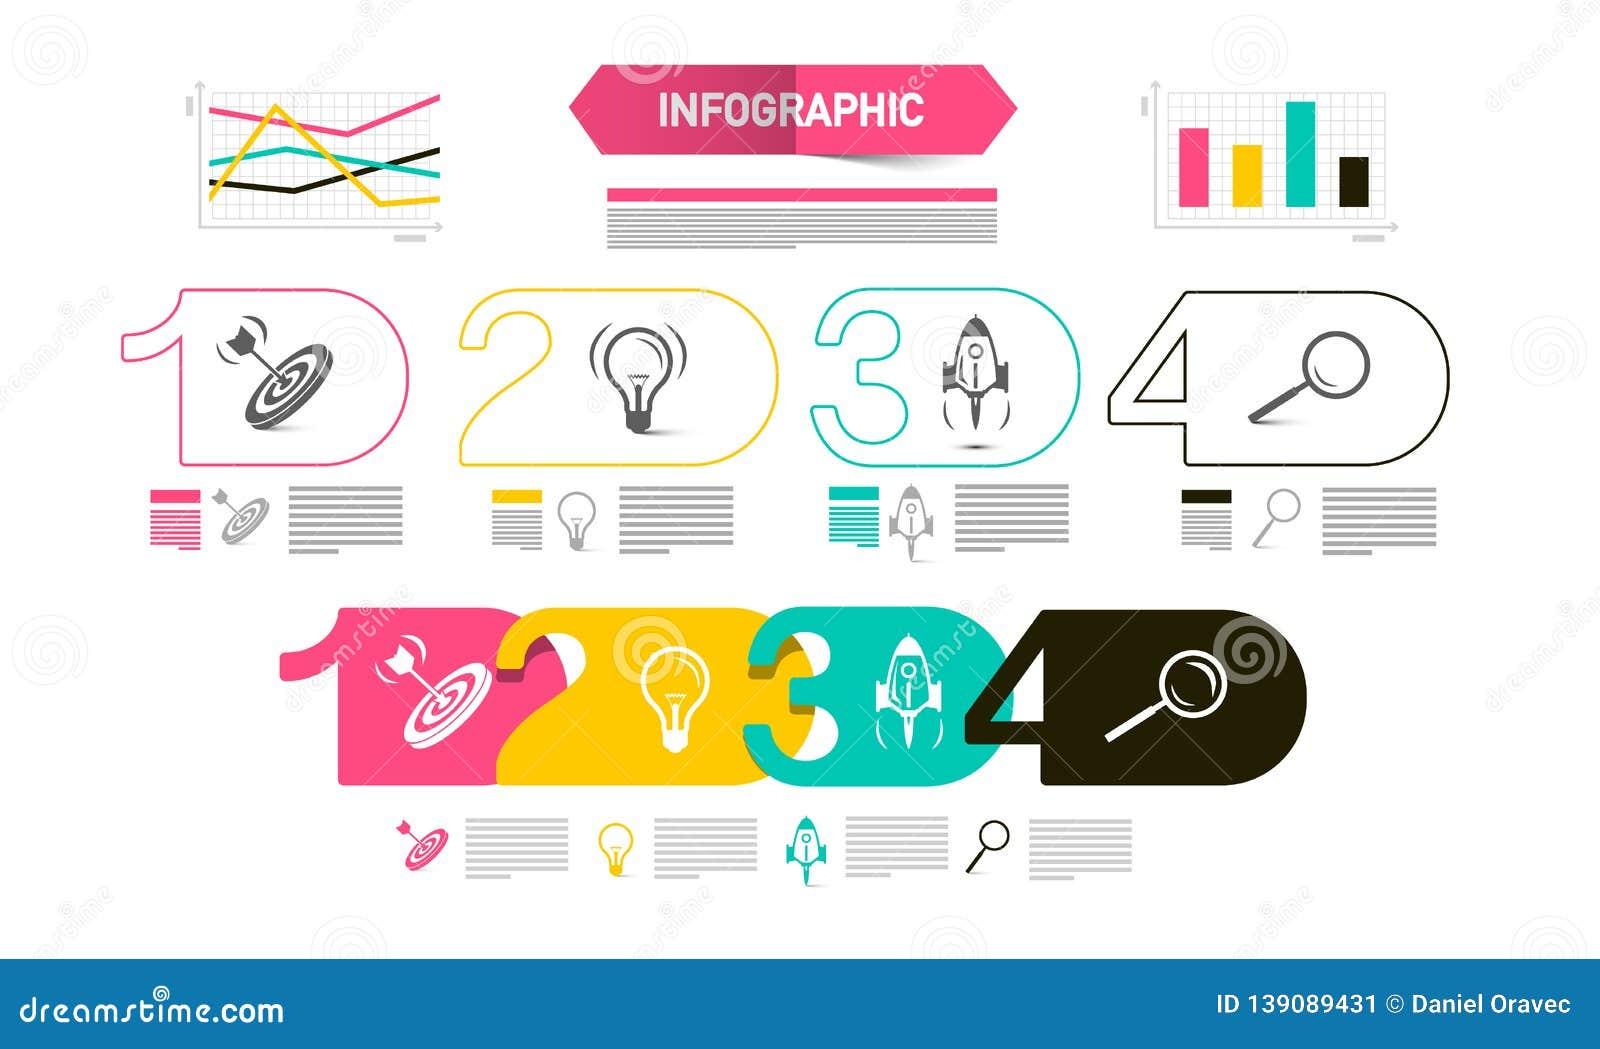 Four Steps Modern Web Presentation with Graphs